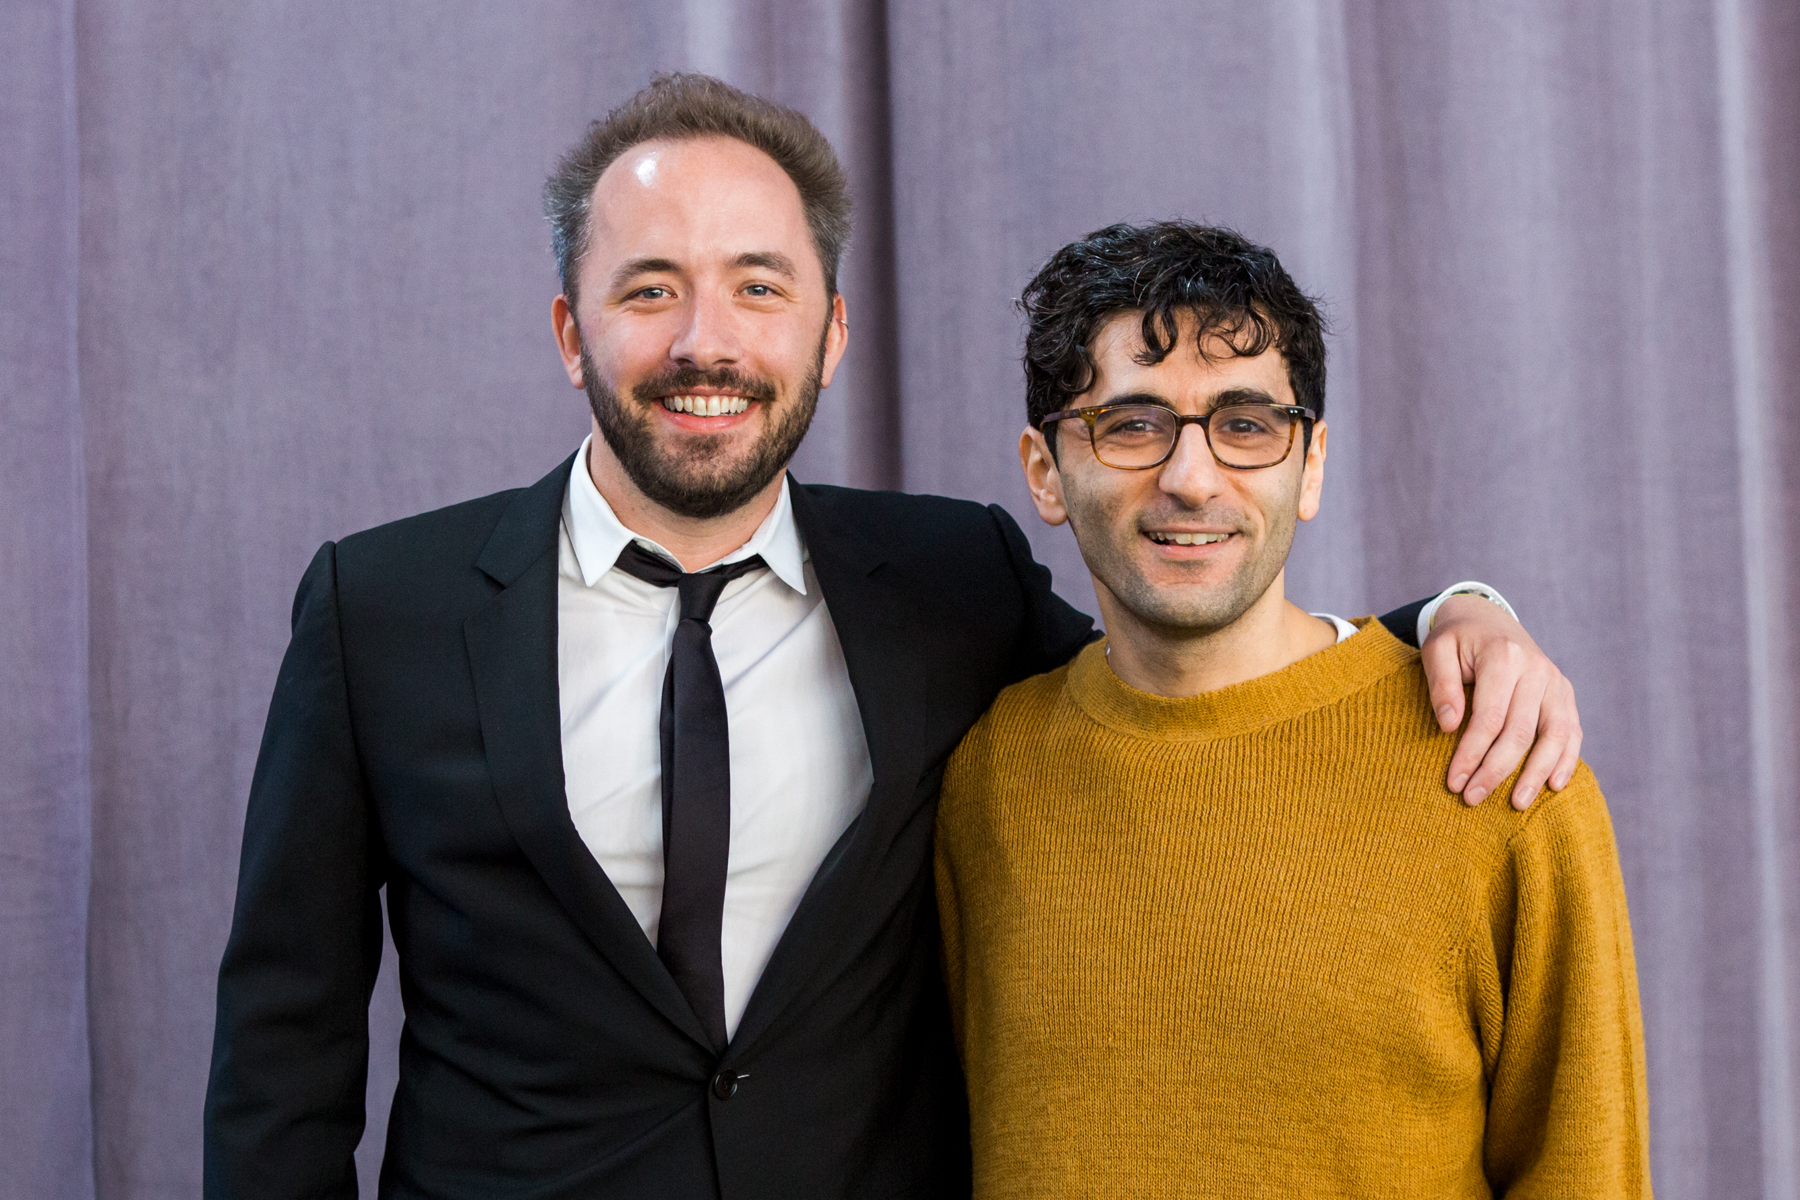 Co-founders Drew Houston (left) and Arash Ferdowsi (right). Image from the Dropbox  Press Kit